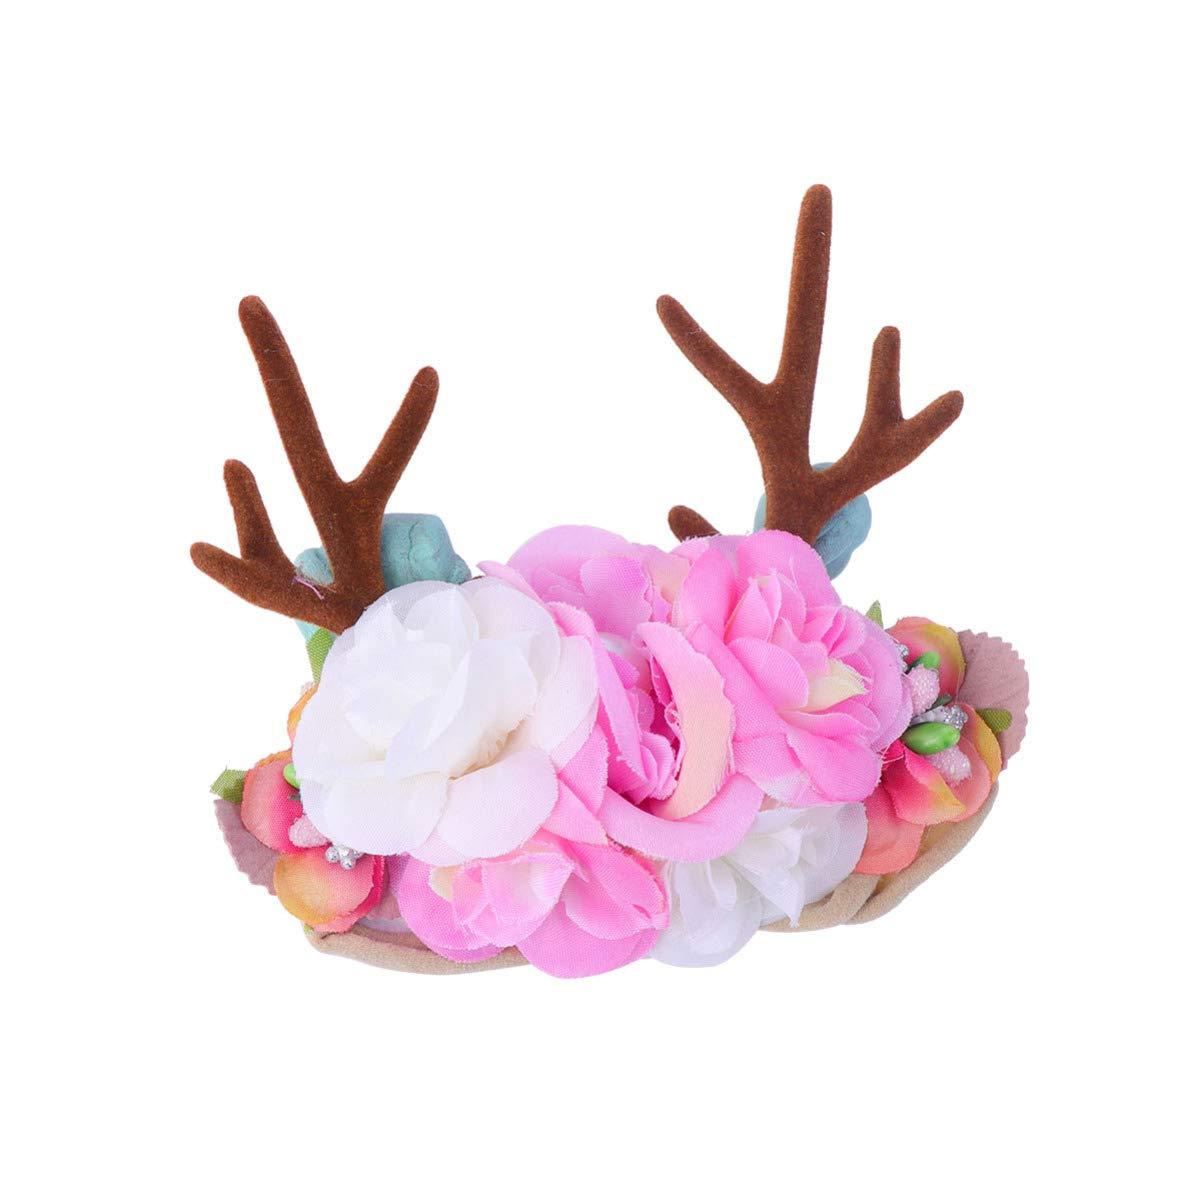 Lurrose Christmas Floral Headbands Nylon Antlers Flowers Crown Elasti Hair Band Cute Headdress Lovely Headwear for Newborn Infant Toddler (Light Pink)